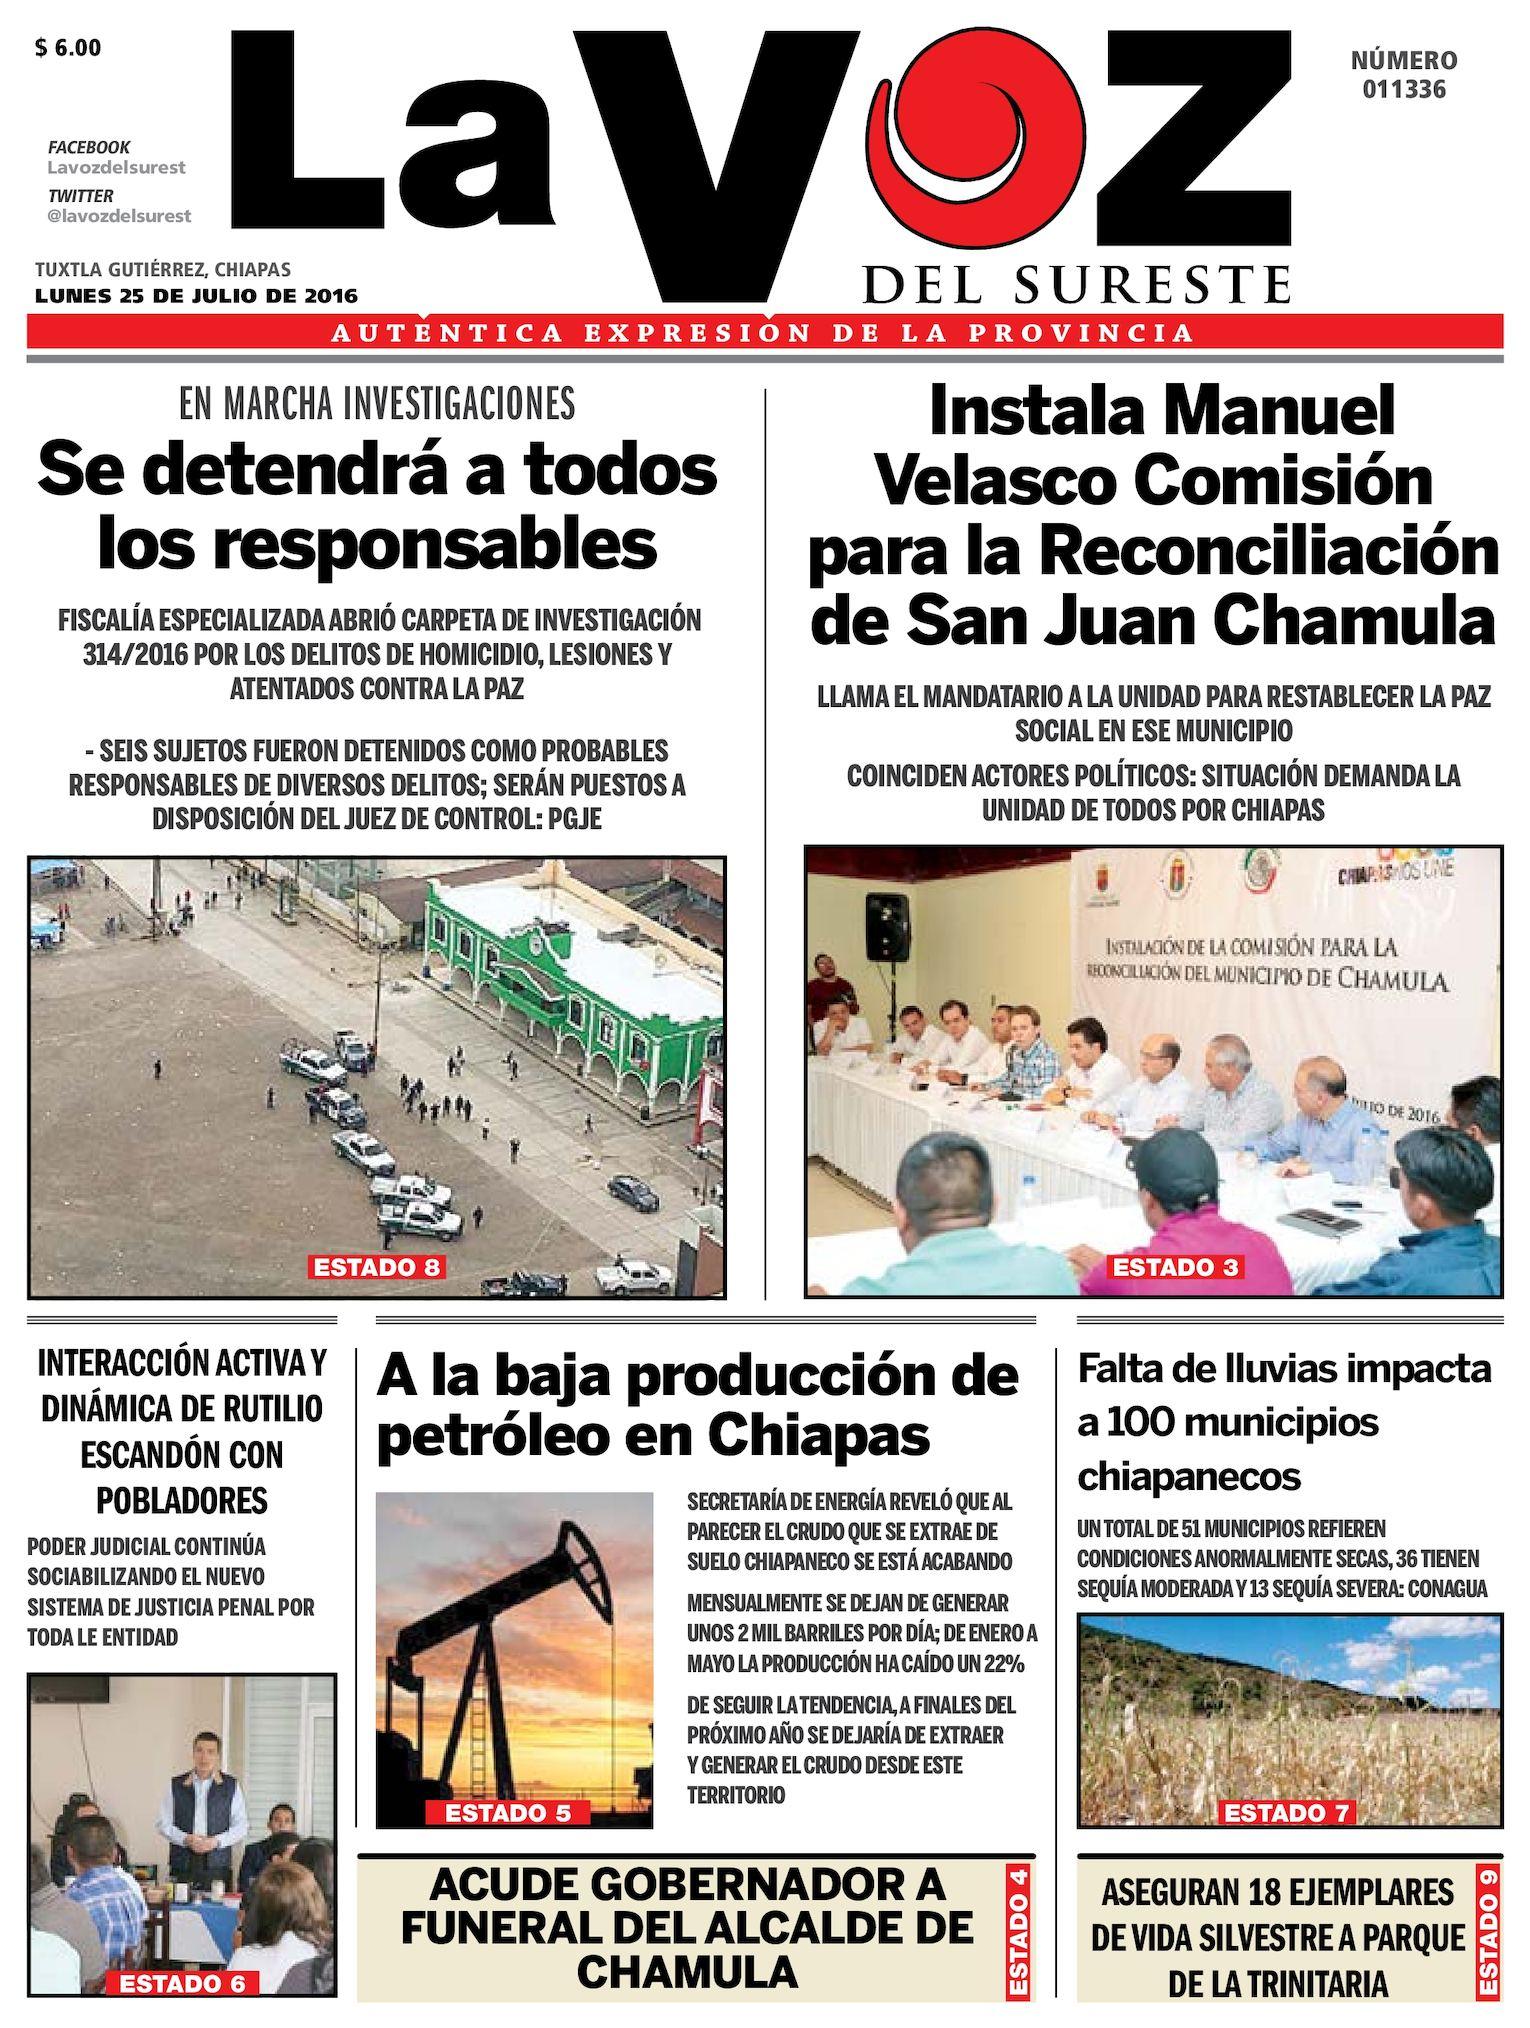 Calaméo - Diario La Voz del Sureste d9faab8c84a09